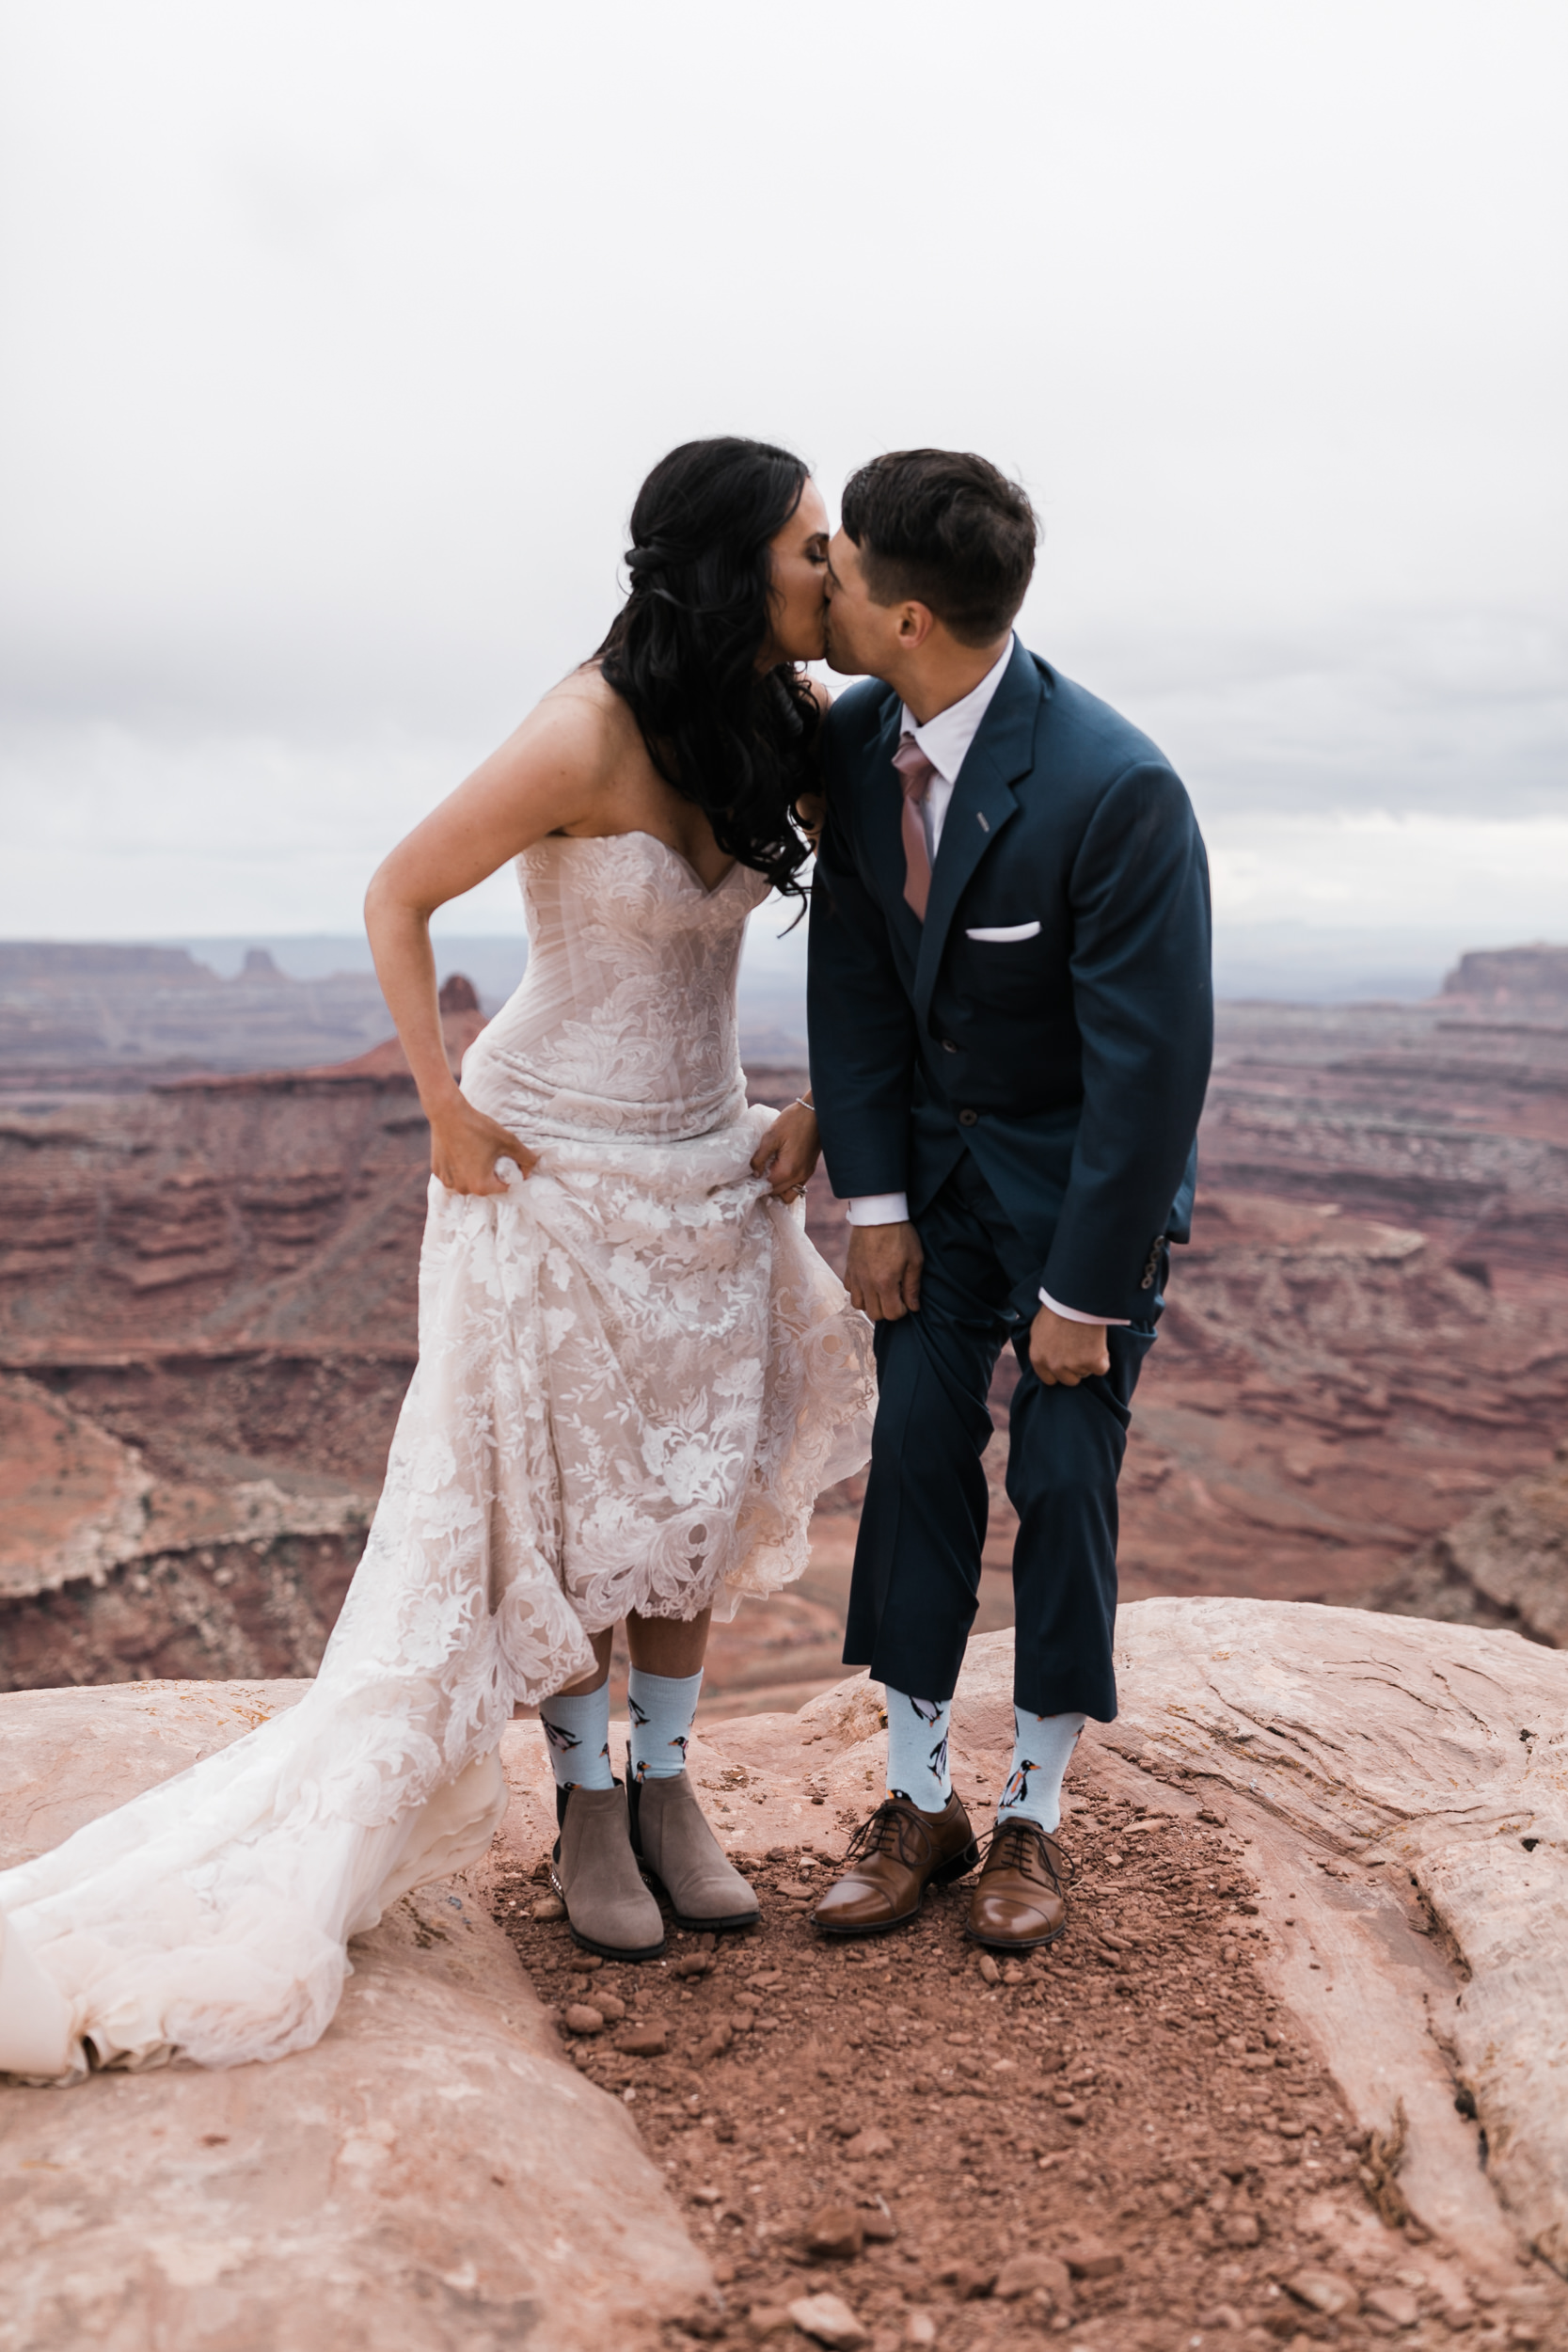 Jeep-Wedding-Moab-Utah-Hearnes-Adventure-Elopement-Photography-54.jpg